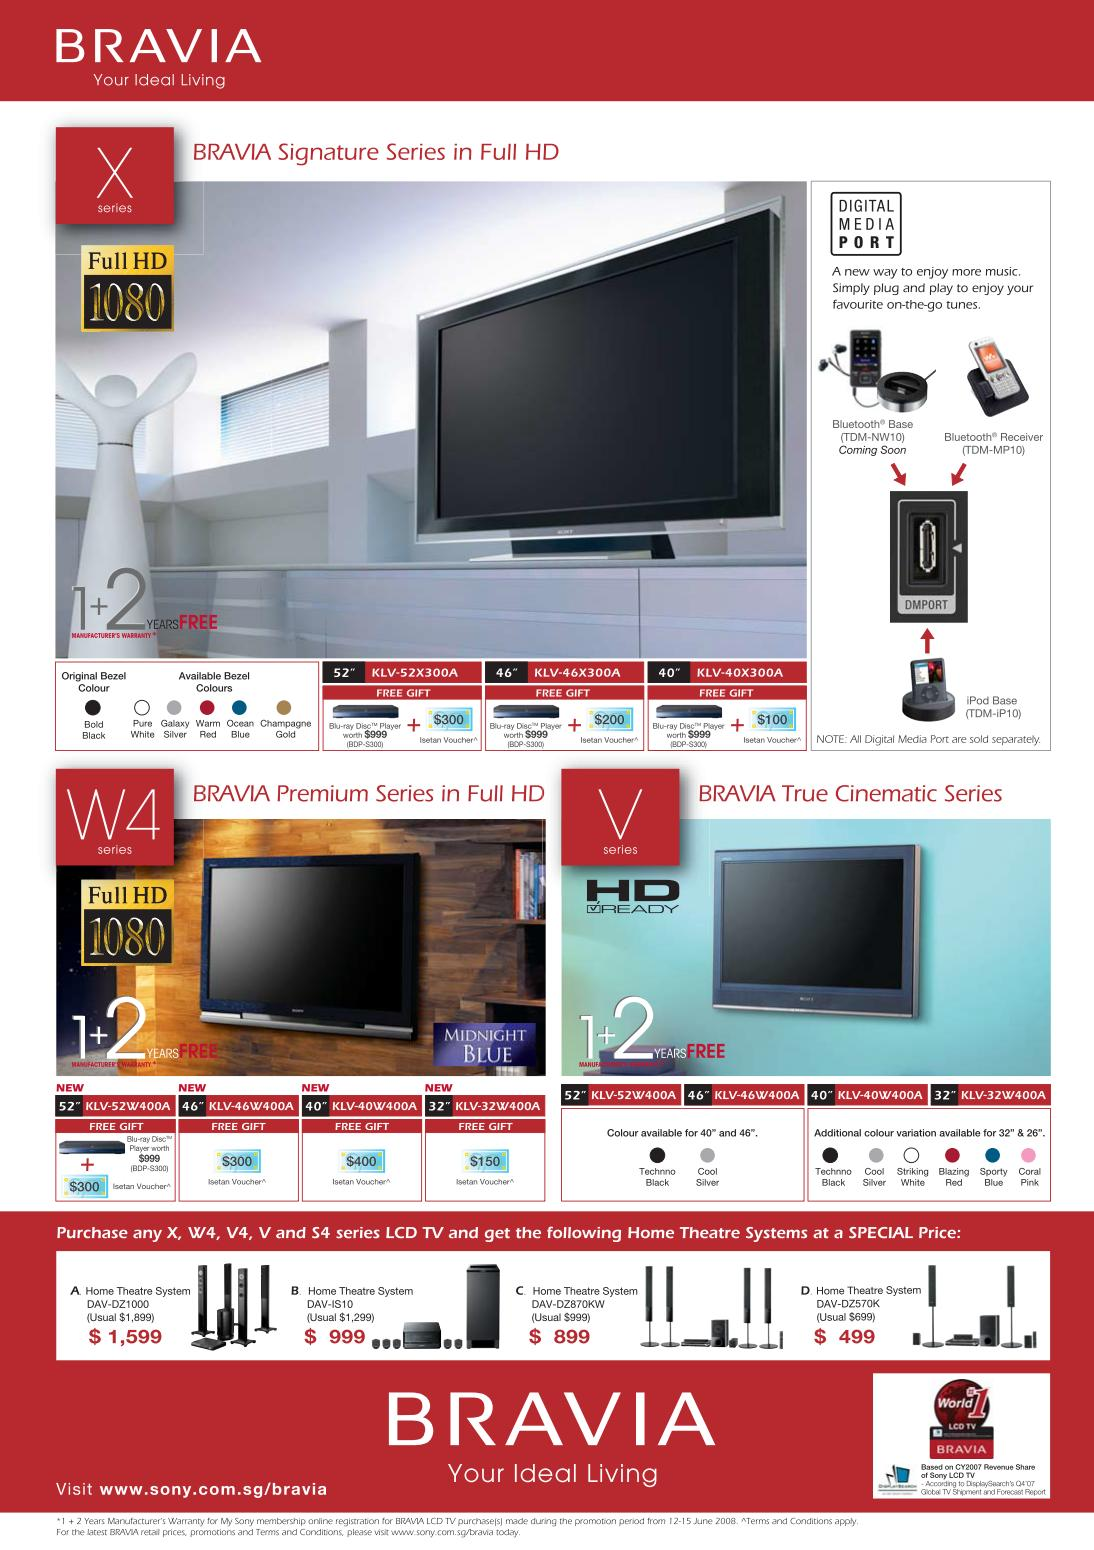 PC Show 2008 price list image brochure of Sony Bravia.pdf 02